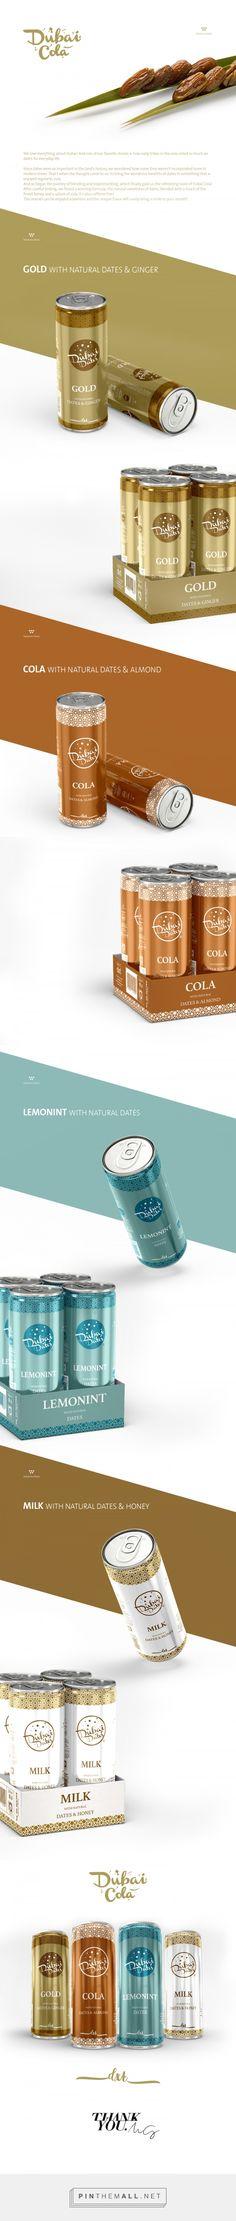 DUBAI DATES by Mostafa Abdel Meguied. Source: Behance. #SFields99 #packaging #design #inspiration #branding #drinks #dates #innovation